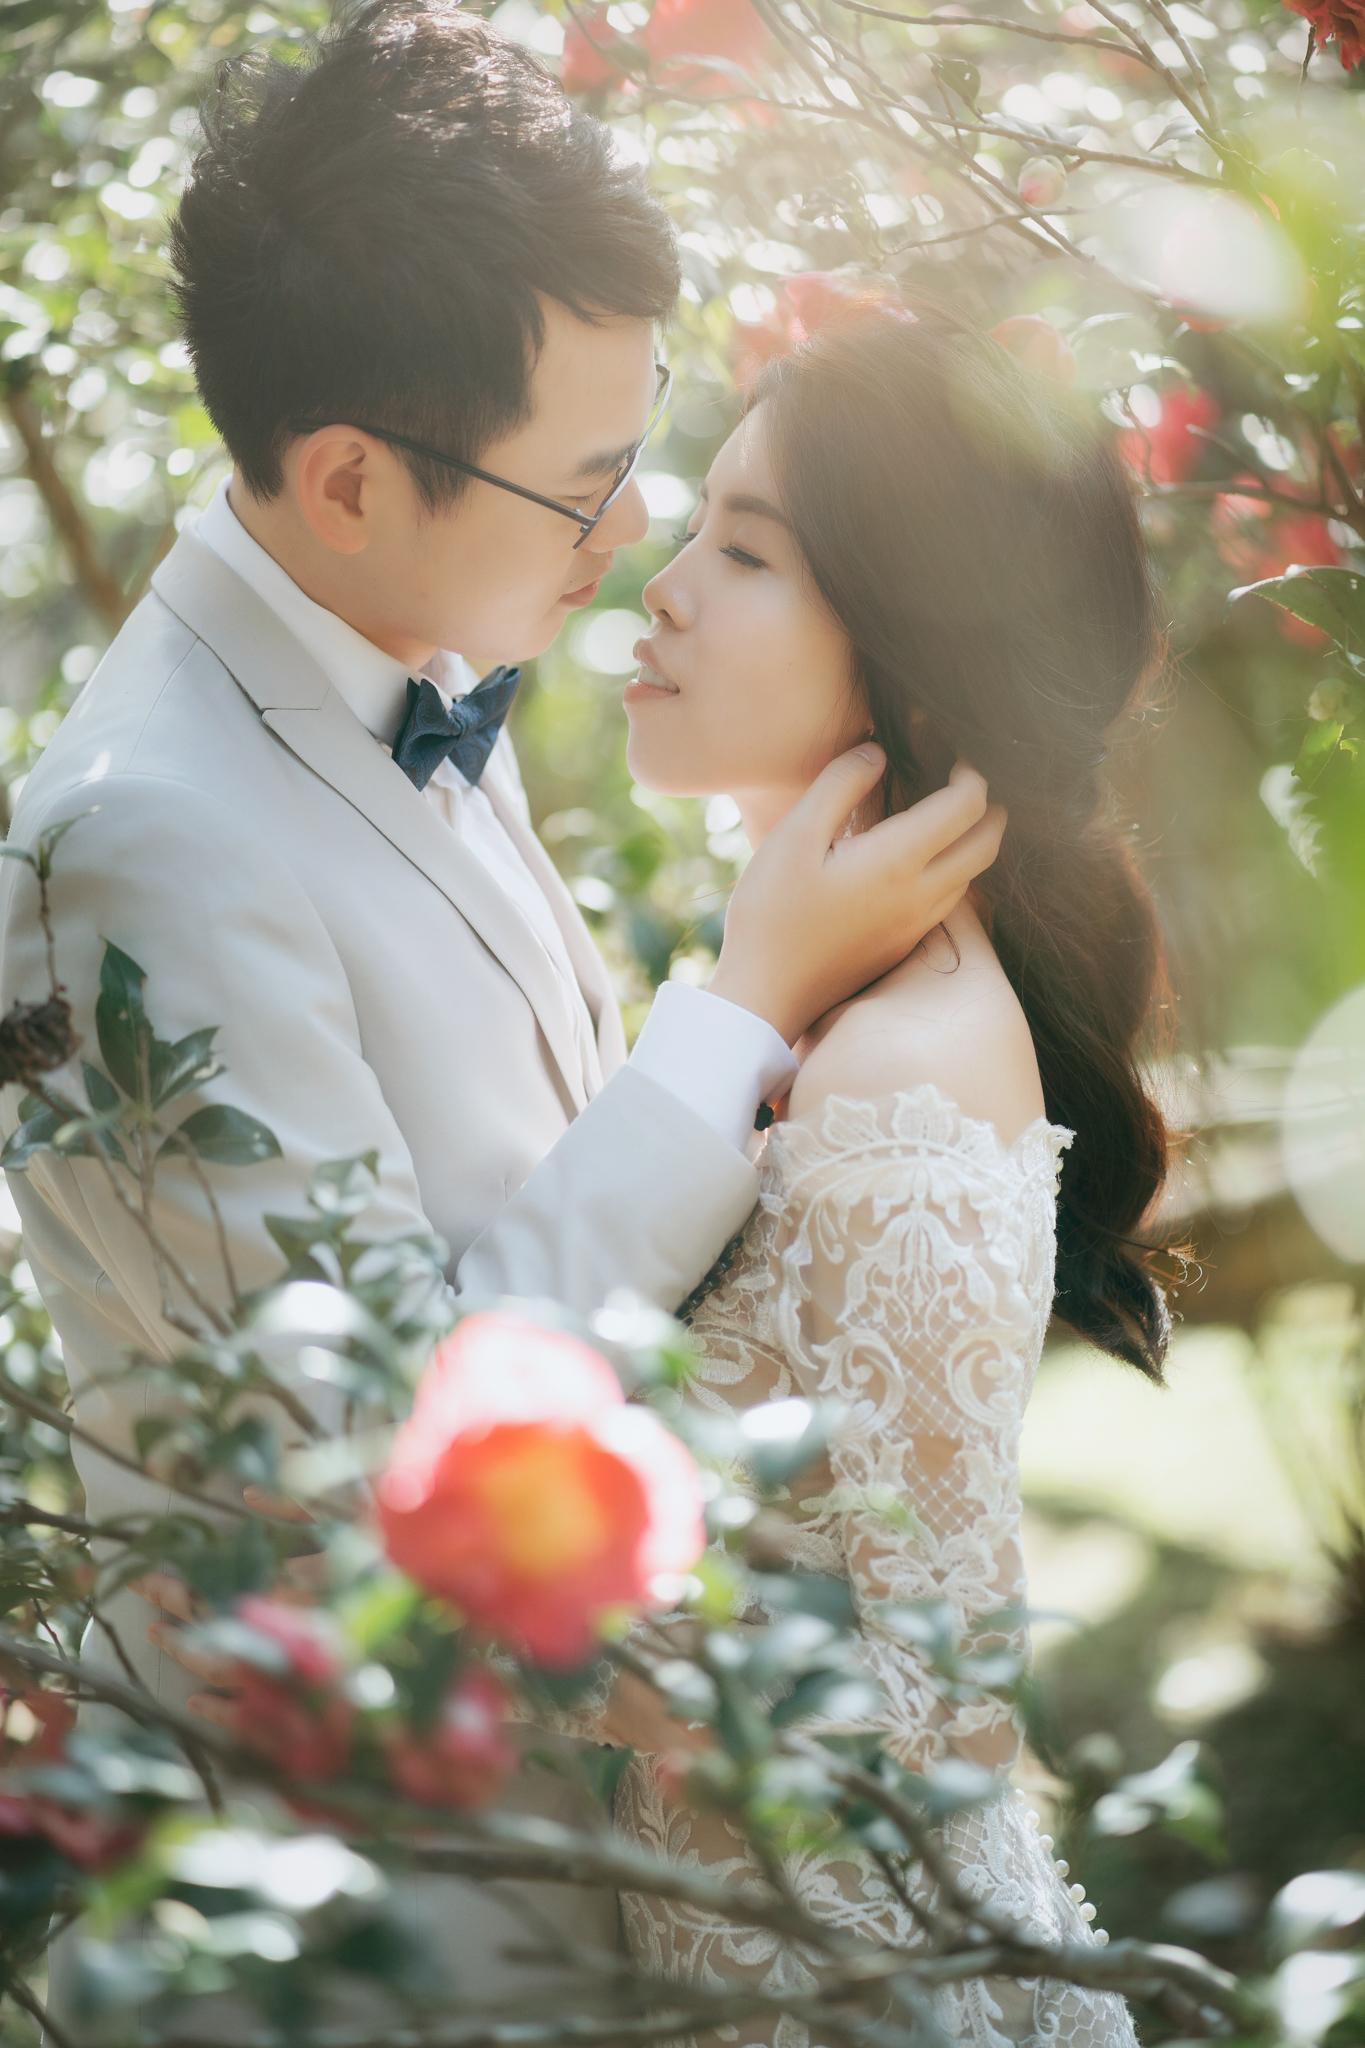 EASTERN WEDDING, 東法, Donfer, 台北婚紗, 陽明山婚紗, 台大婚紗, 南雅奇岩